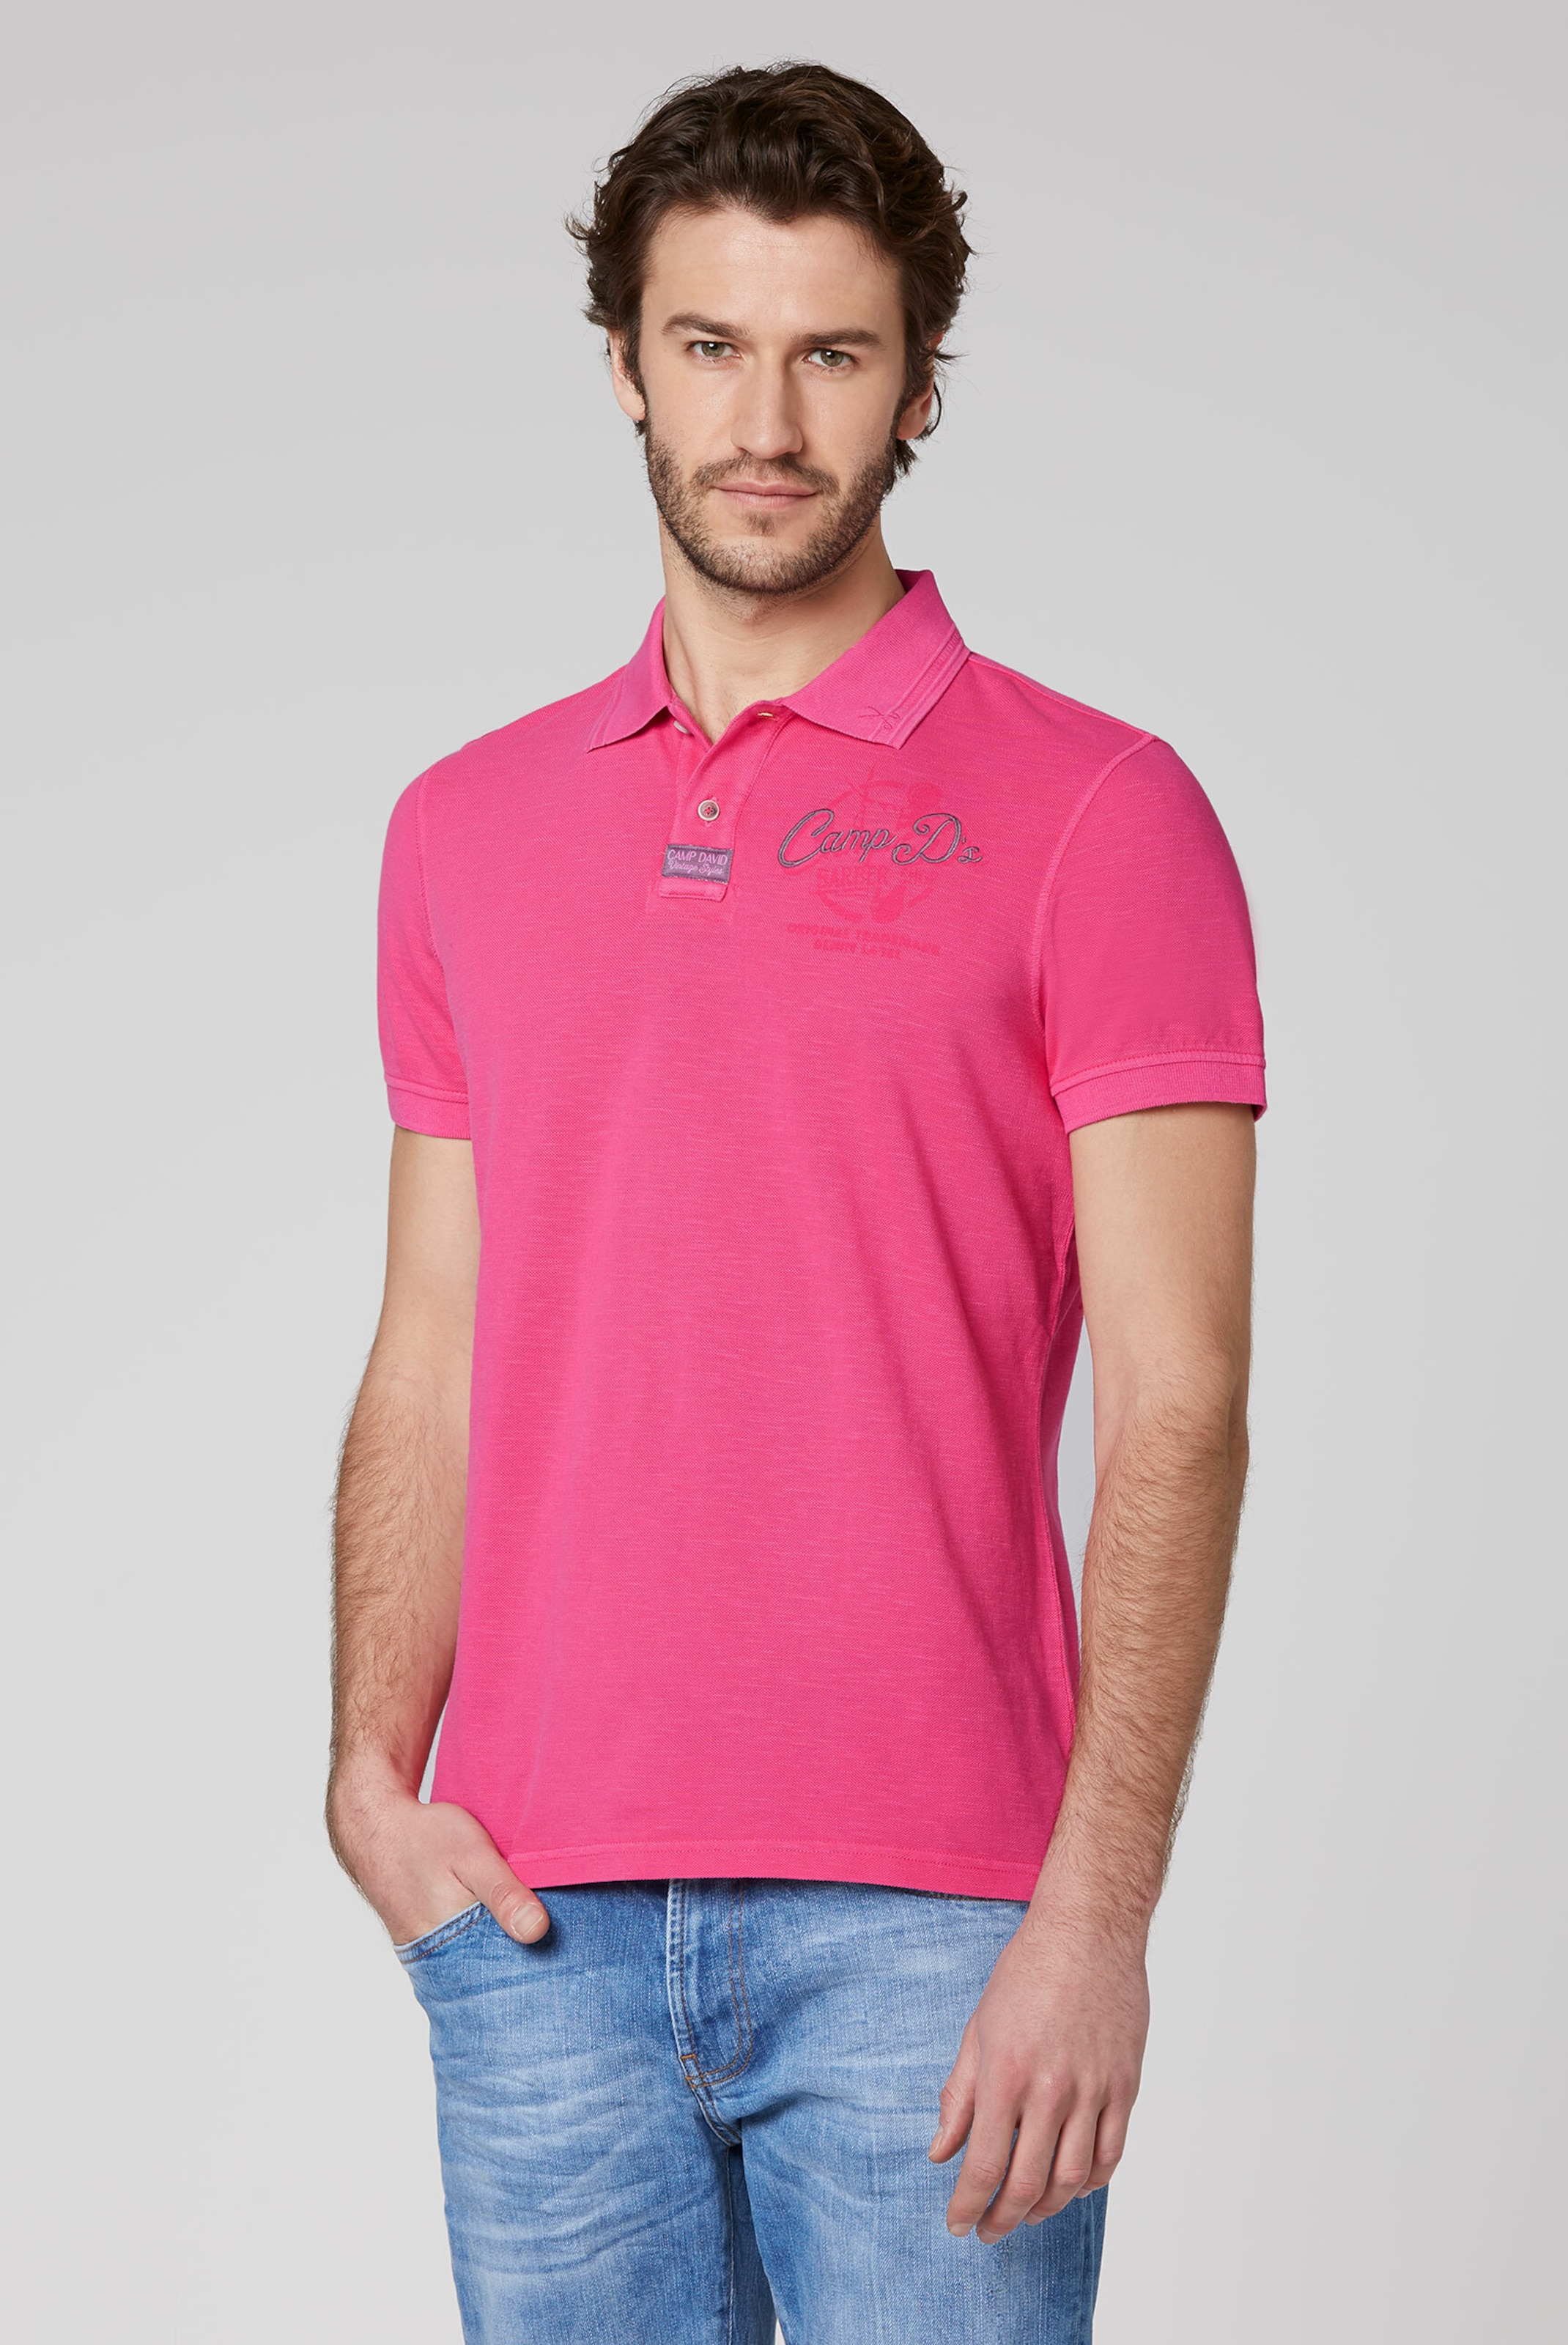 CAMP DAVID Poloshirt in pink Unifarben I00045894RED0286L